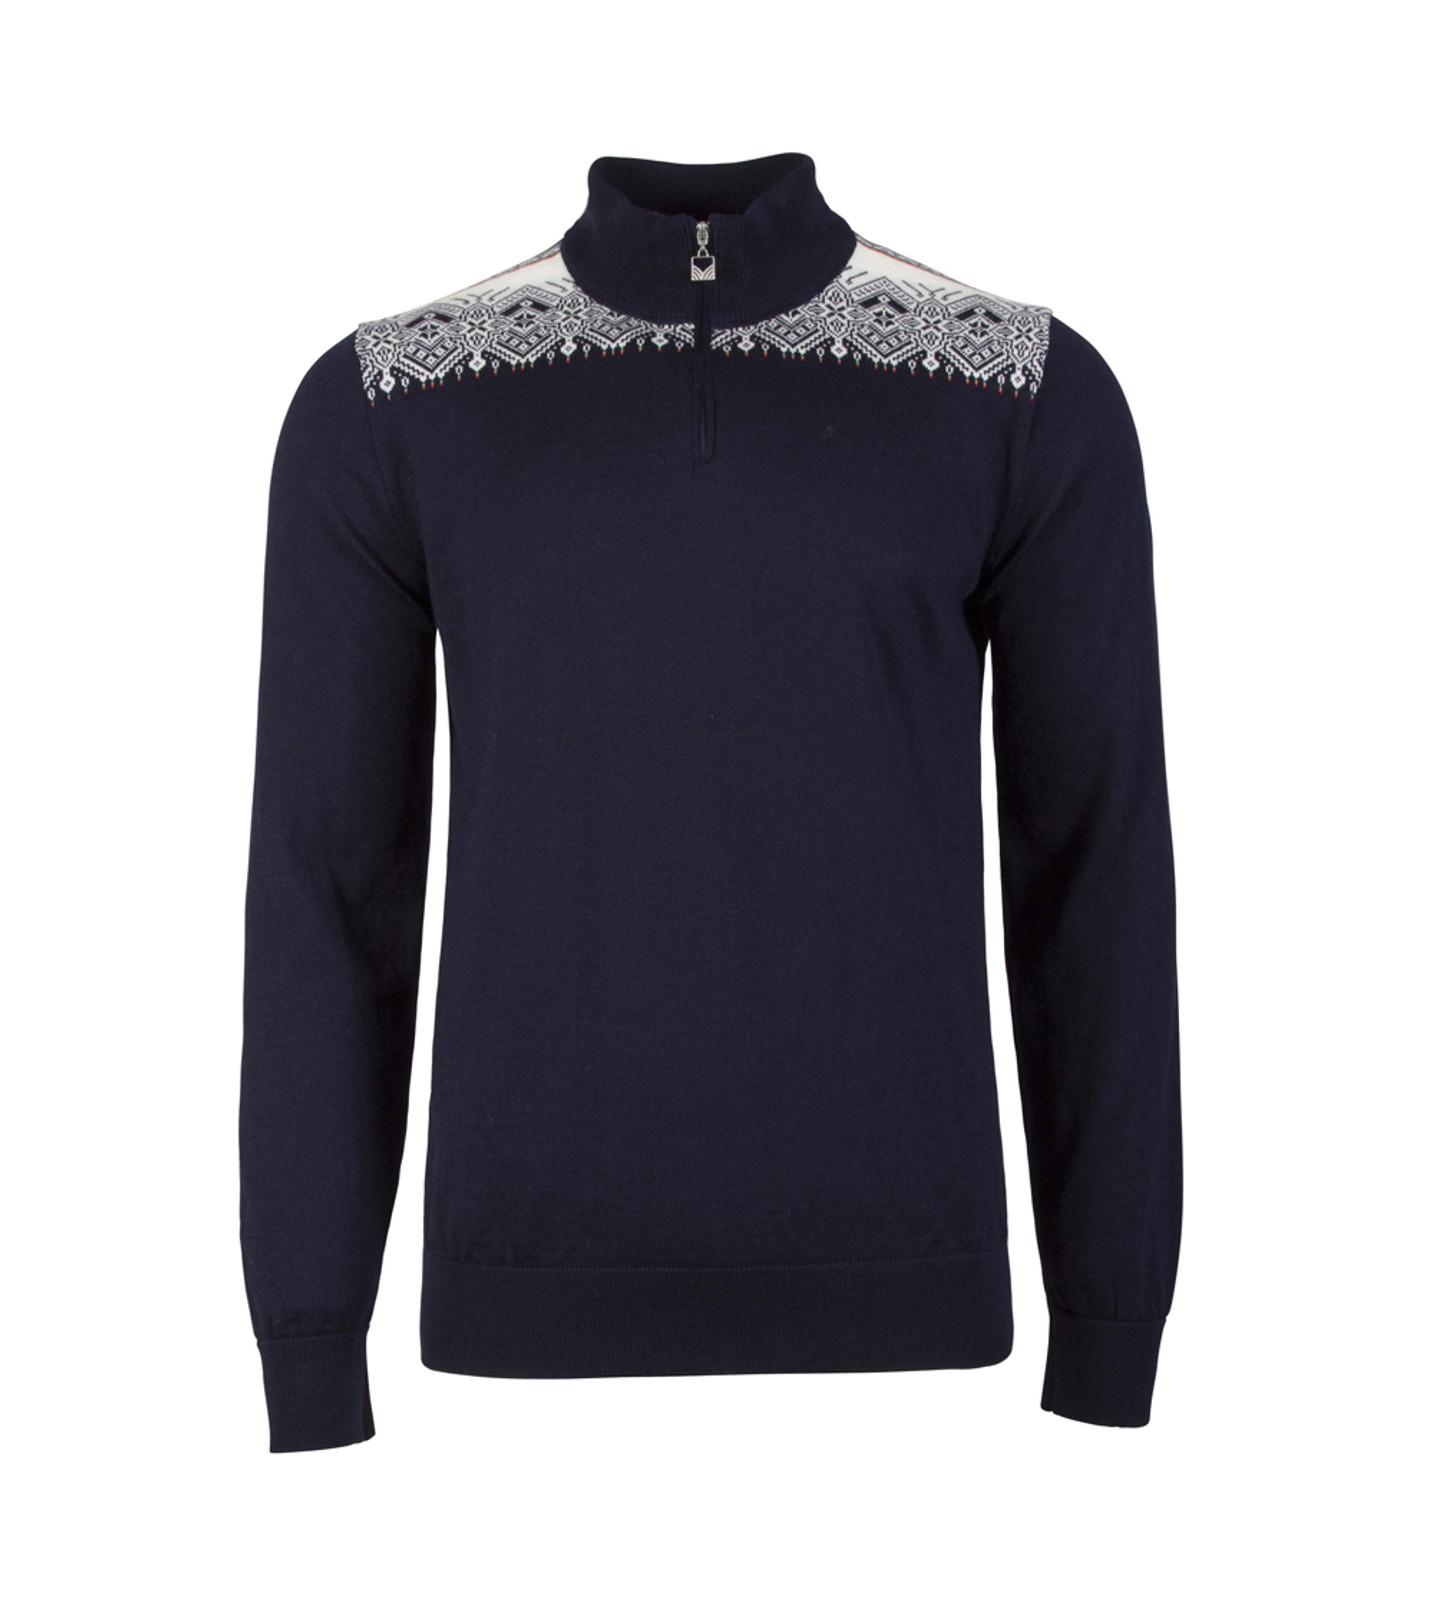 Dale of Norway Fiemme Sweater, mens, in Navy/Raspberry/Orange Peel/Peacock/Off White, 93421-C